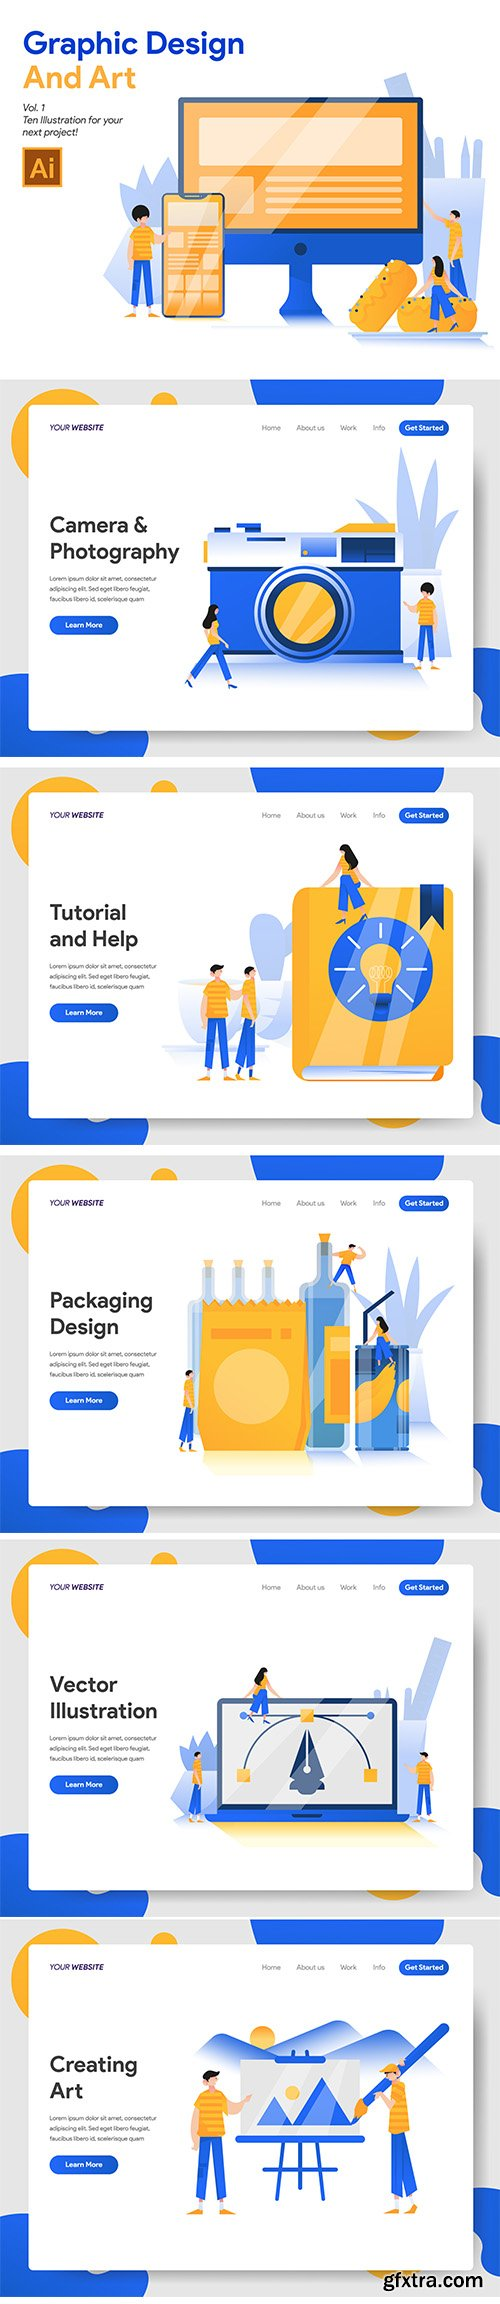 Vector Illustrations Set - Graphic Design and Art Vol 1